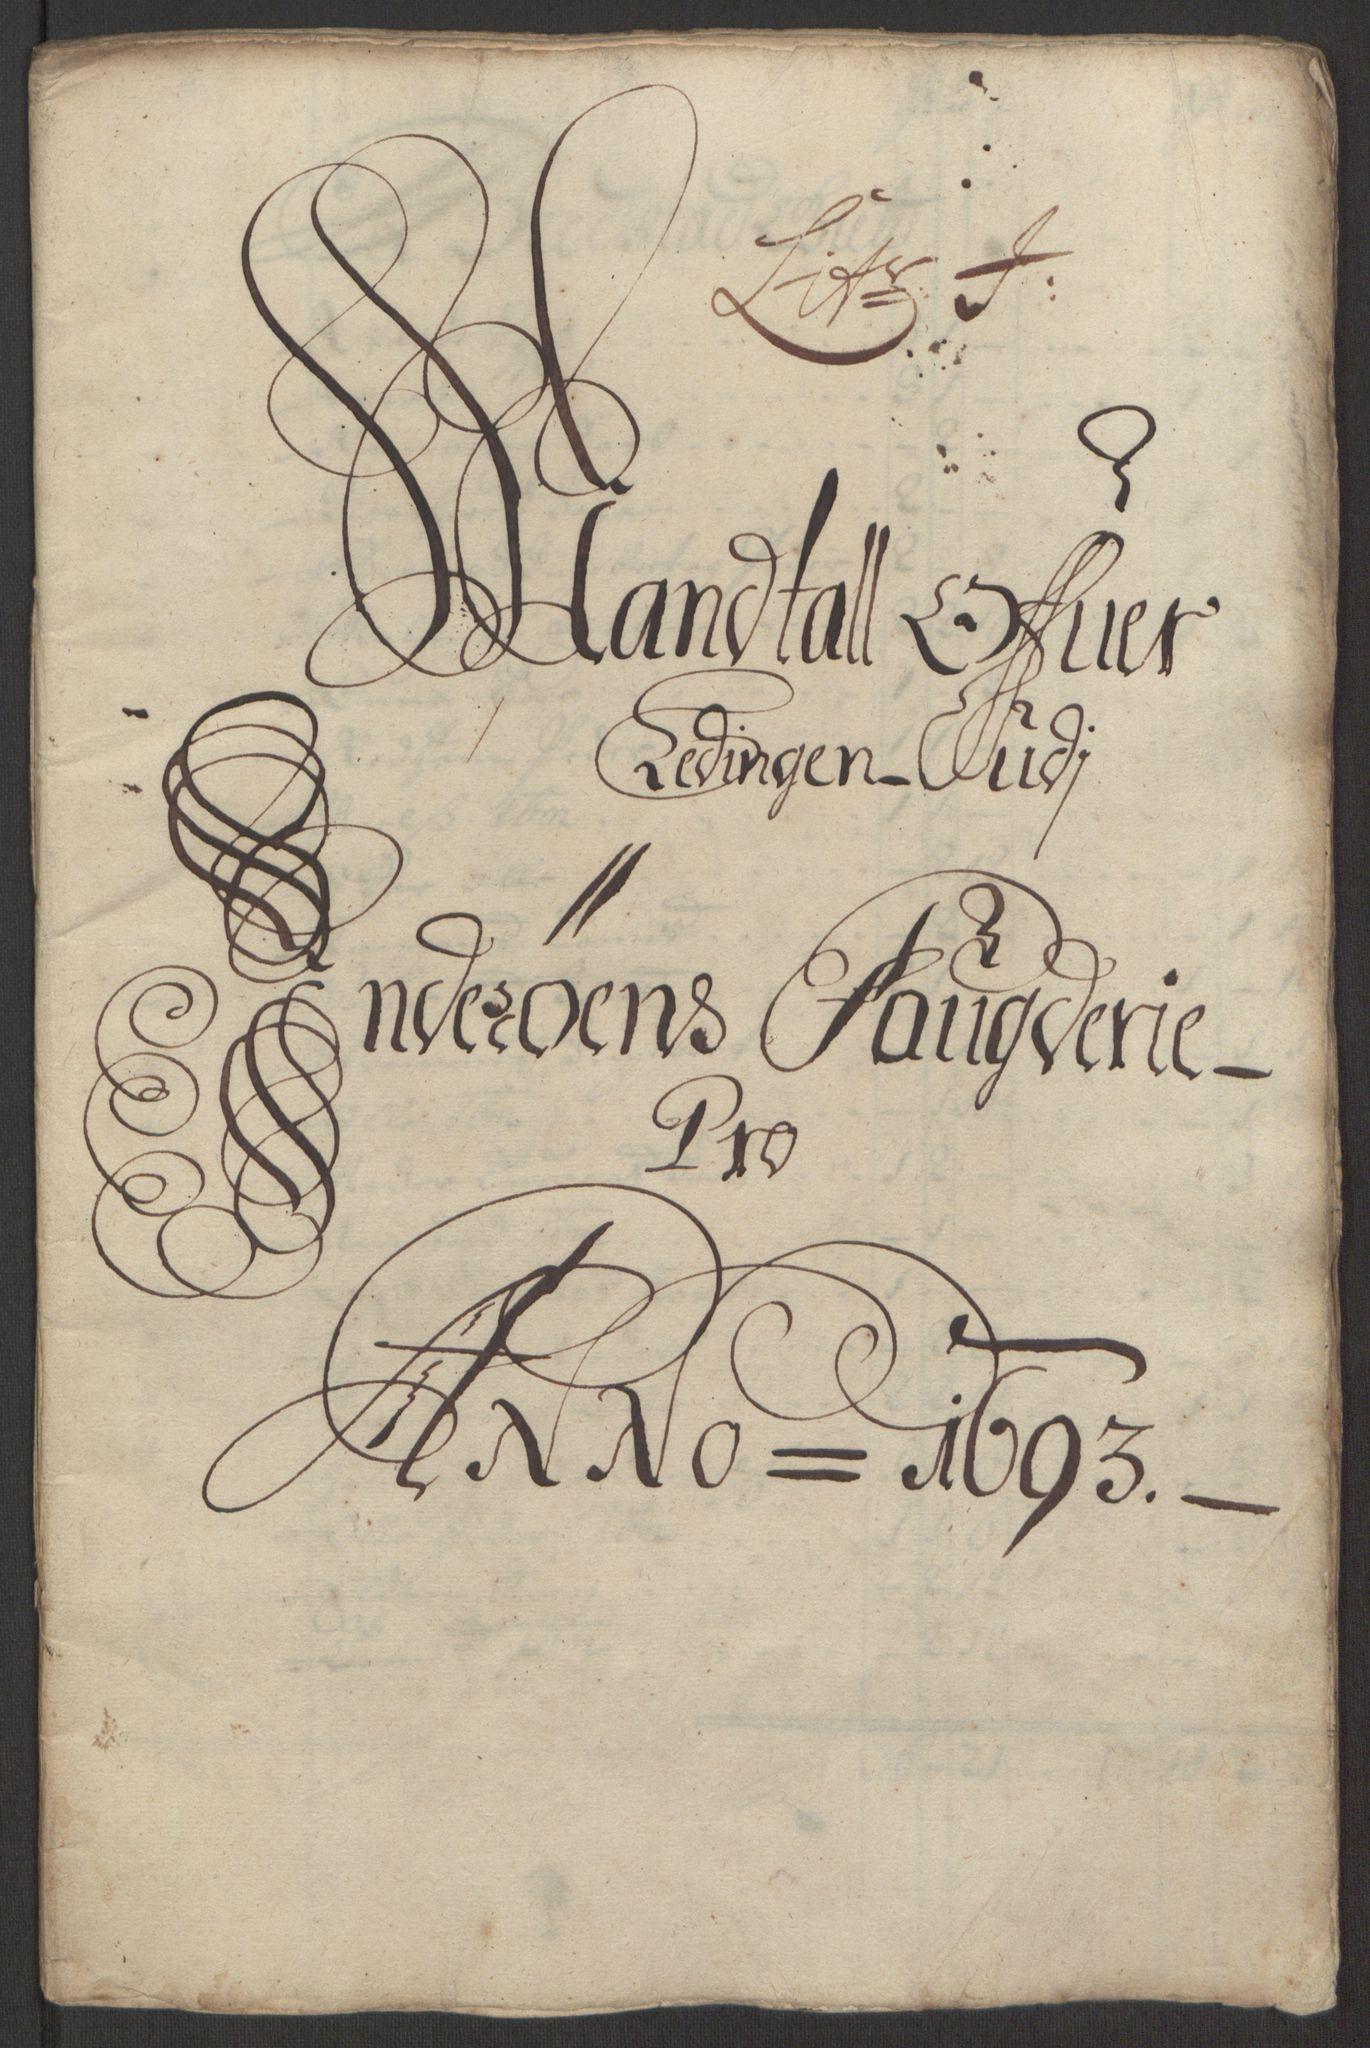 RA, Rentekammeret inntil 1814, Reviderte regnskaper, Fogderegnskap, R63/L4308: Fogderegnskap Inderøy, 1692-1694, s. 478